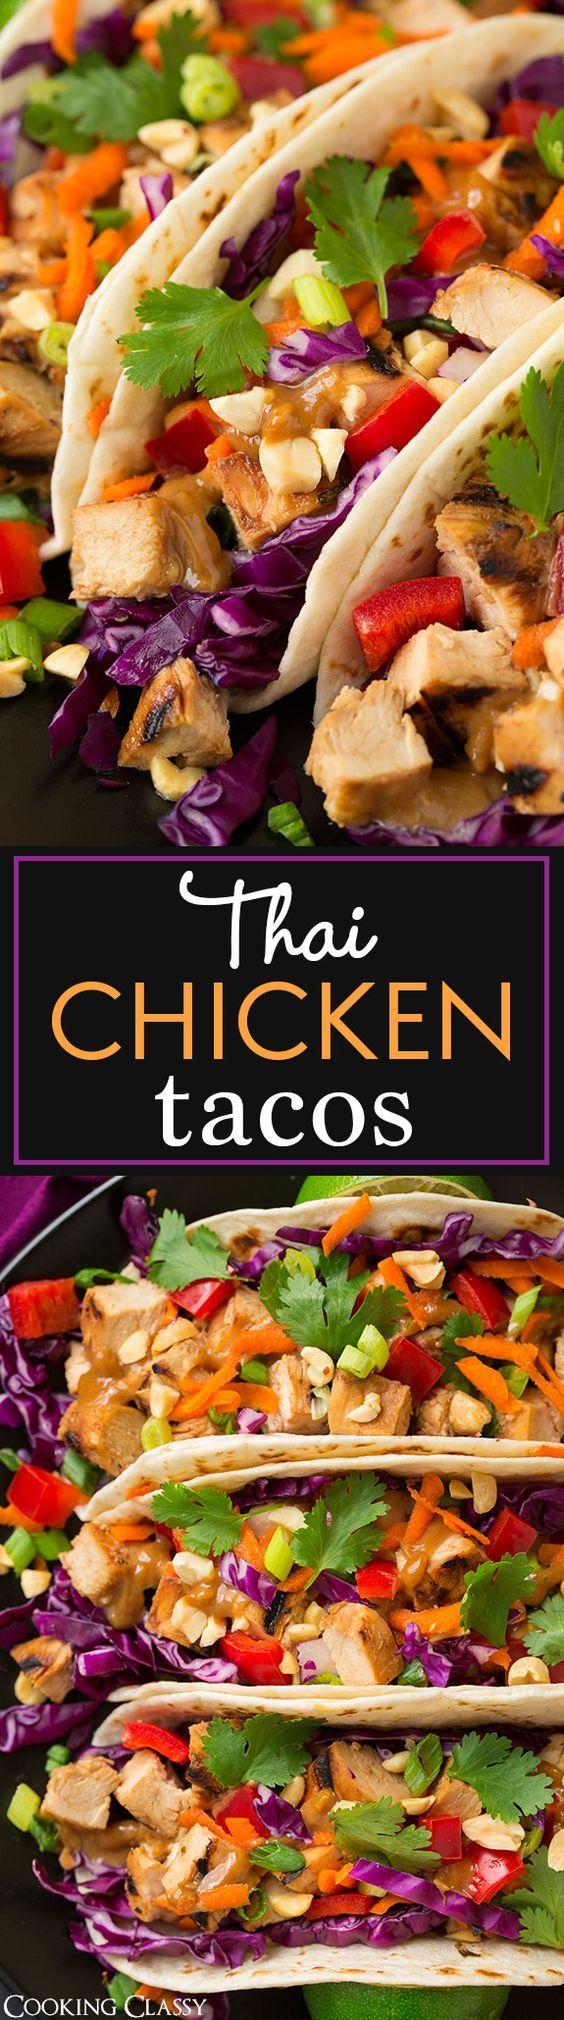 Thai Chicken Tacos with Peanut Sauce